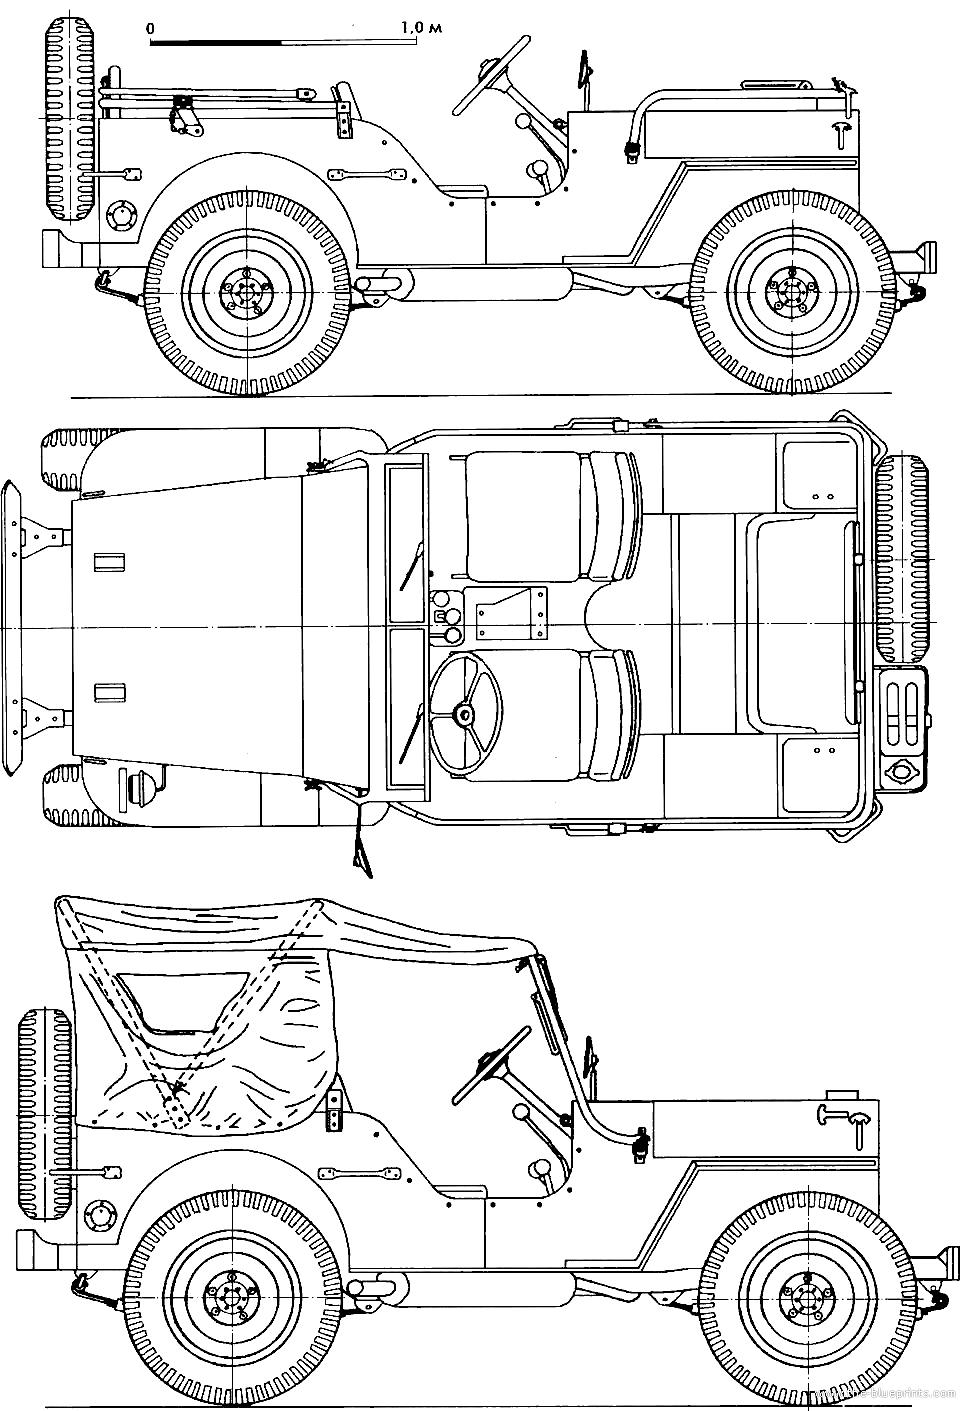 Willys Jeep Mb 1942 In 2020 Willys Jeep Willys Mini Jeep